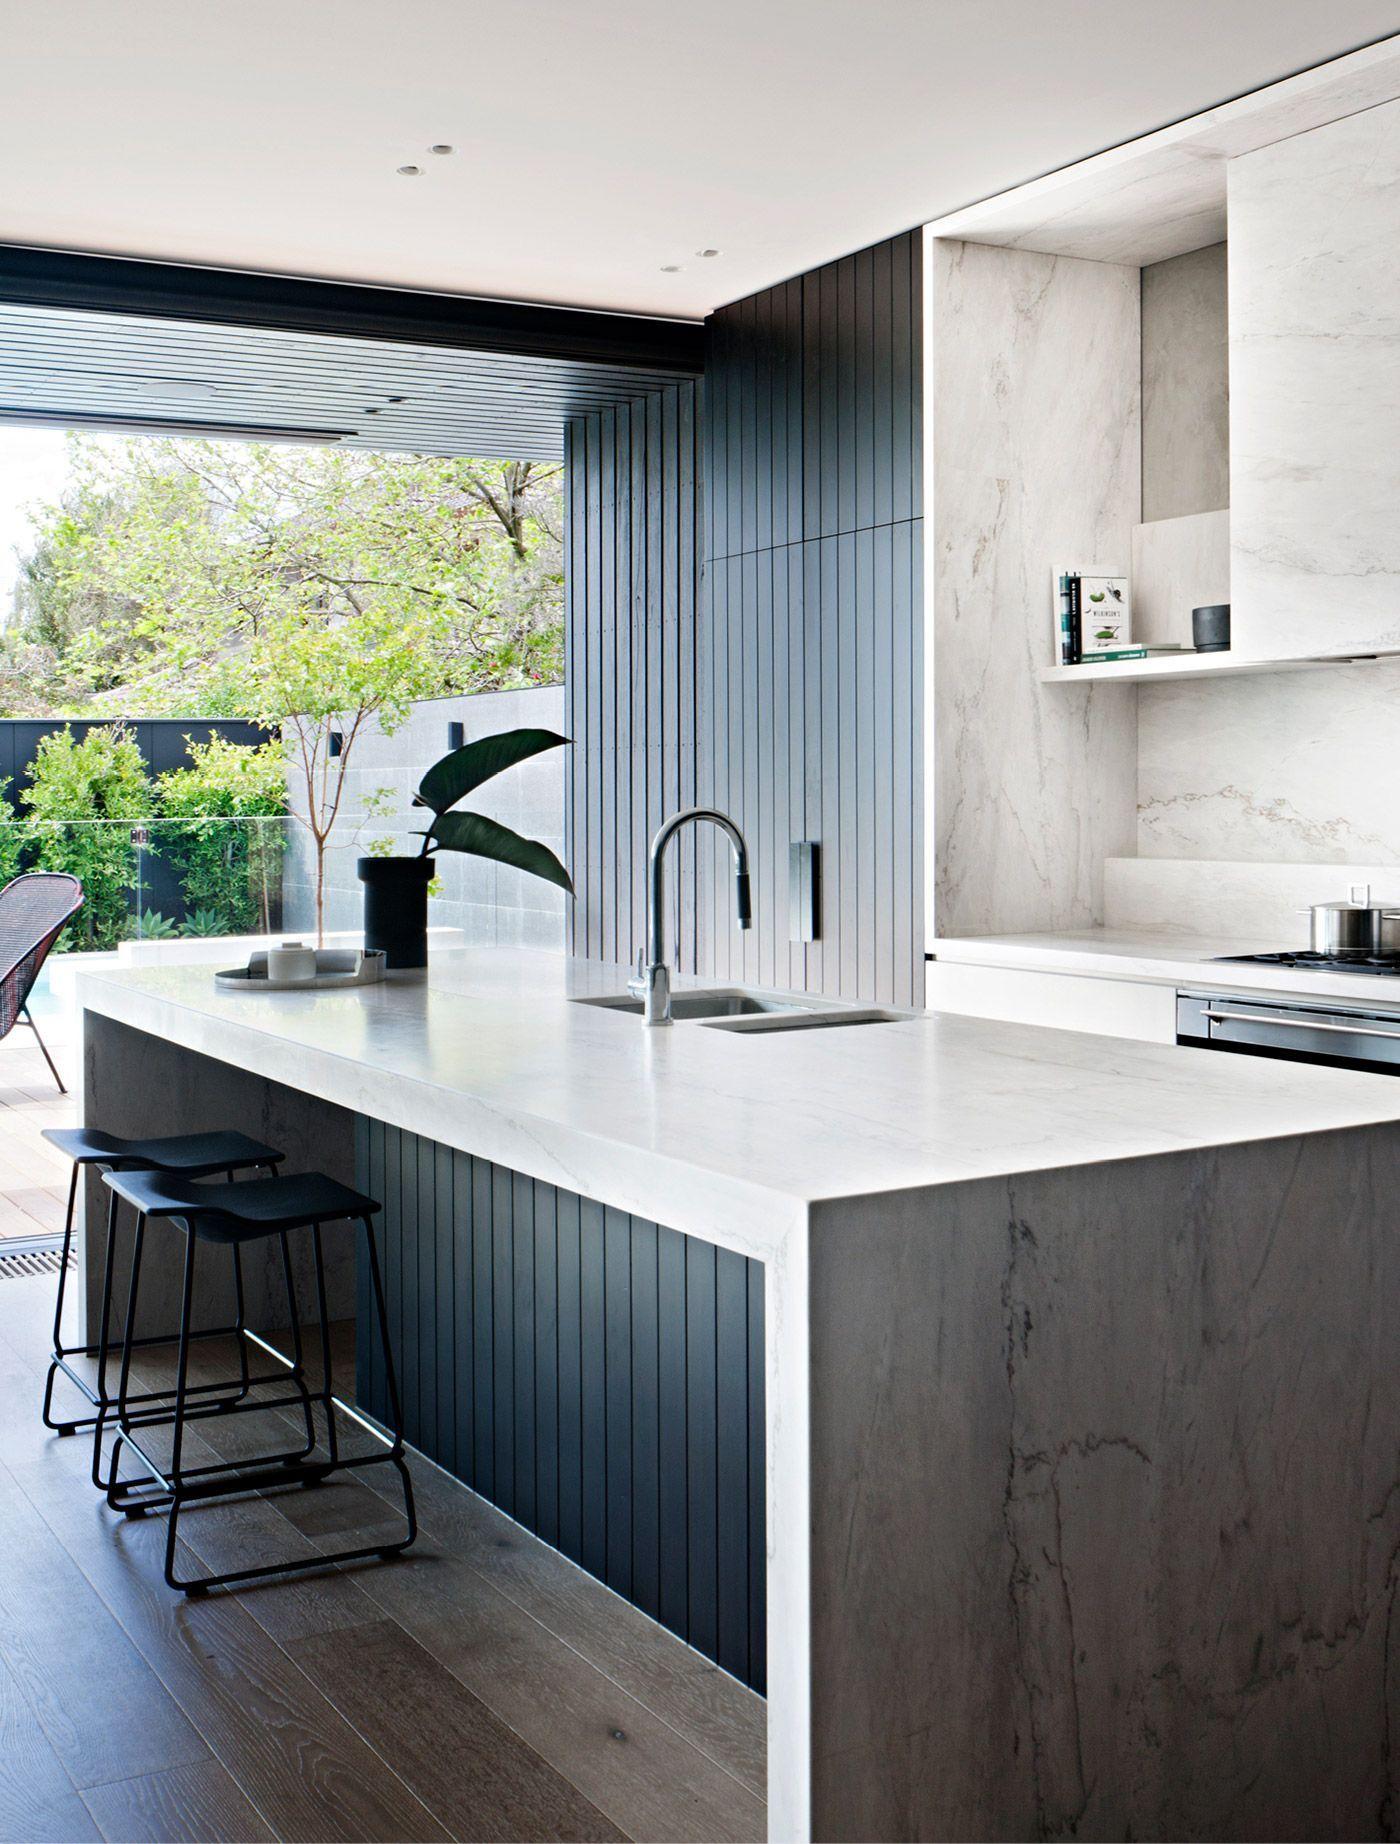 10 Kitchens With Black Appliances In Trending Design Ideas For Your Kitchen Modern Kitchen Design Kitchen Design Contemporary Kitchen